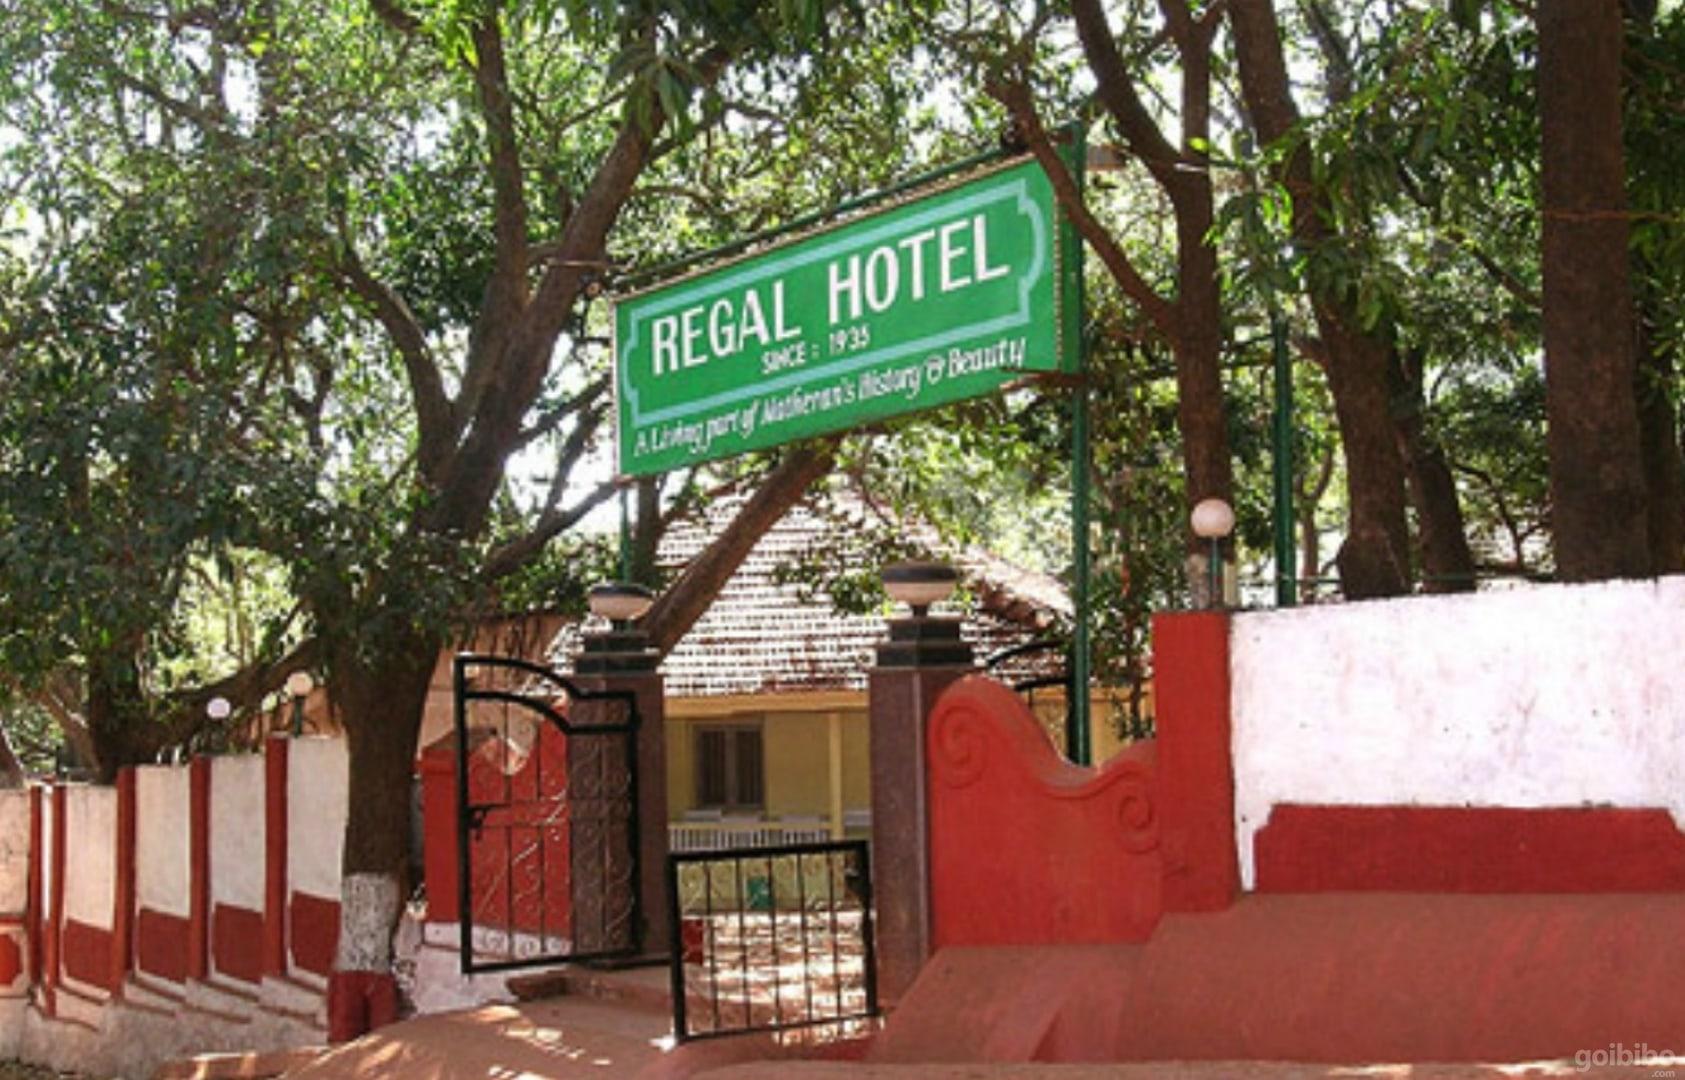 Regal Hotel - Top Restaurants in Matheran